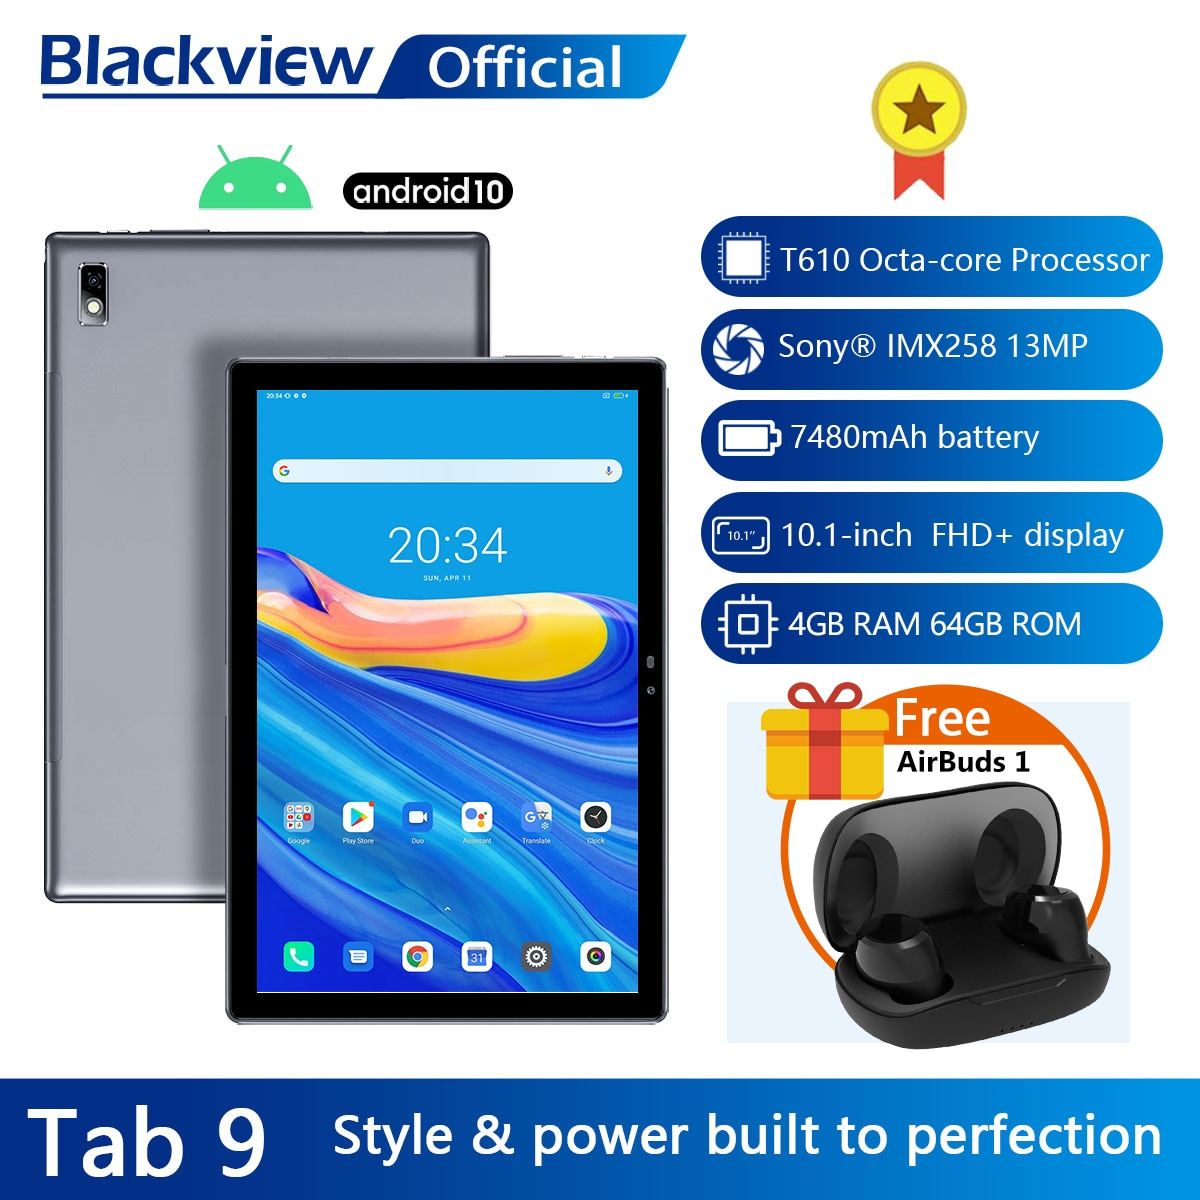 Blackview Tab 9 10.1'' Android 10 Tablet 1920x1200 Octa Core 4GB RAM 64GB ROM 4G Network 13MP Rear Camera 7480mAh Tablets PC